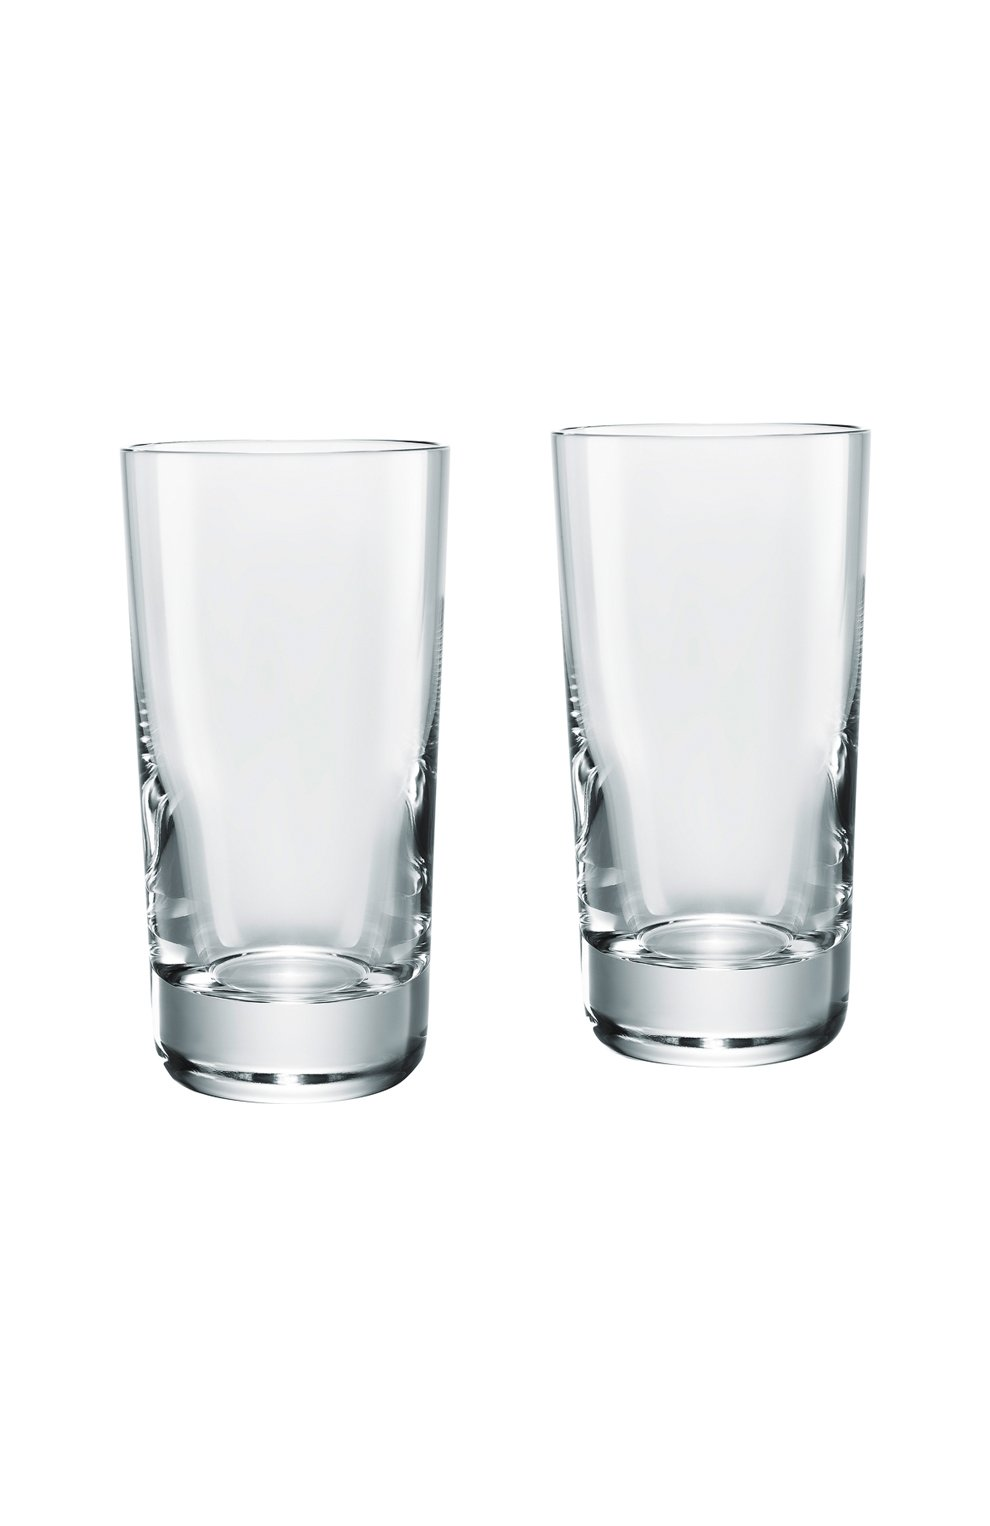 Мужского набор из 2-х стаканов для сока perfection BACCARAT прозрачного цвета, арт. 2 811 582 | Фото 1